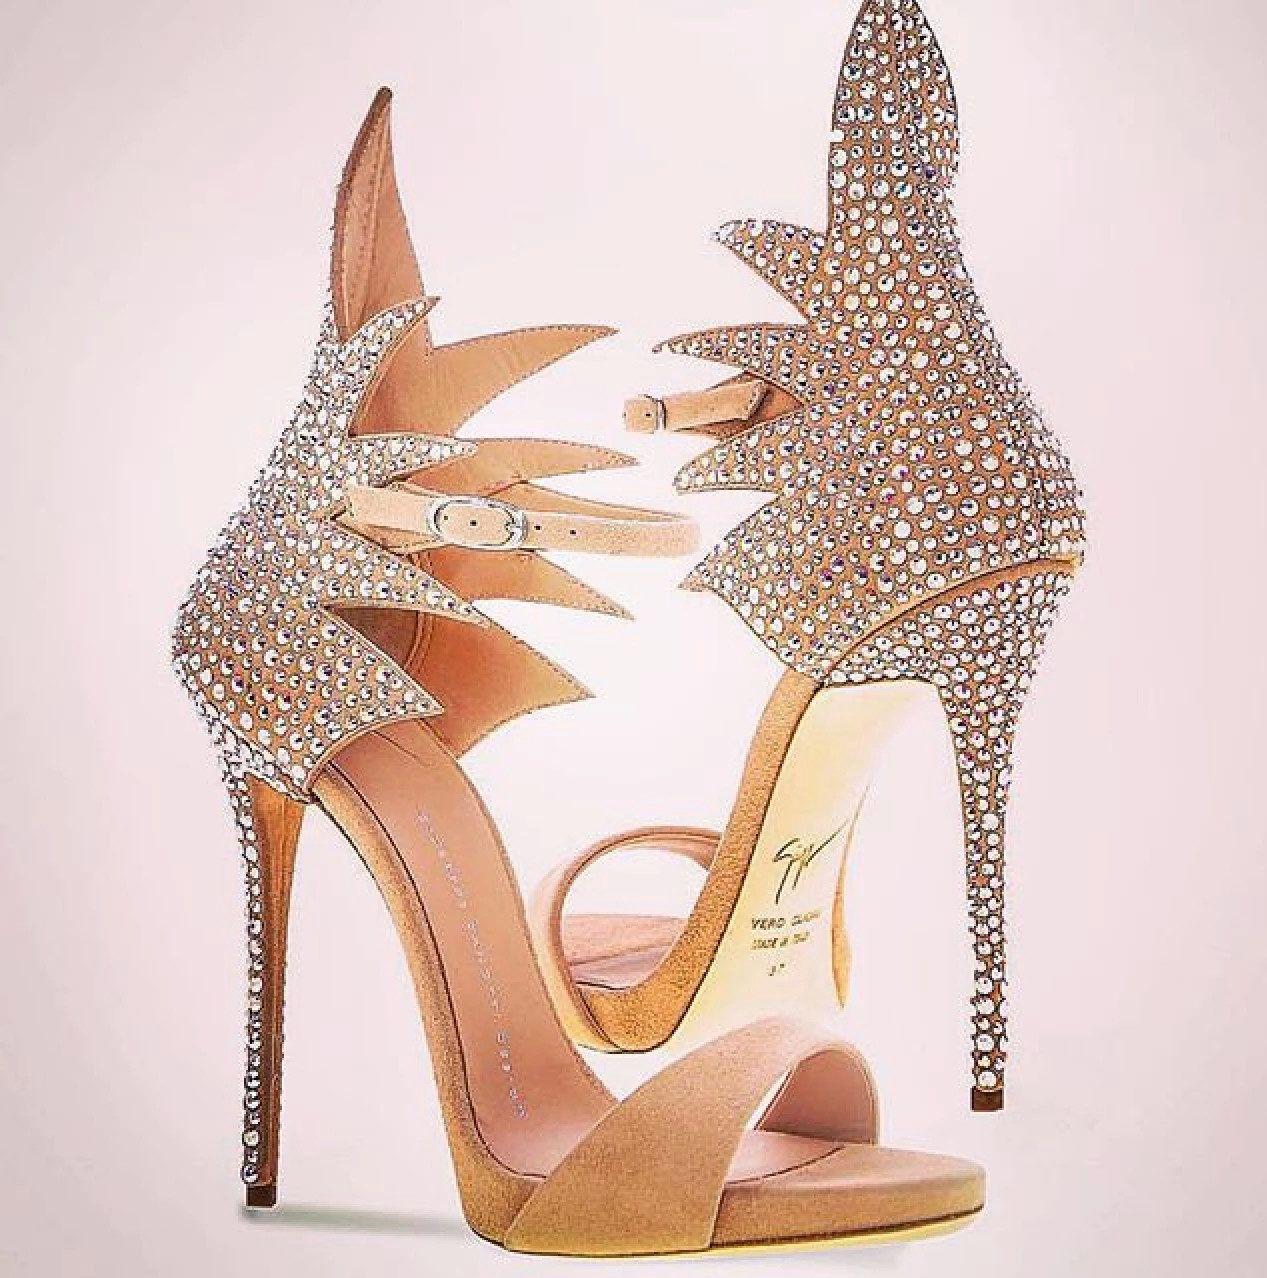 Lujosas sandalias para los eventos de noche. Impresionante belleza! #shoes #luxury #fashion #moda #estilo #style